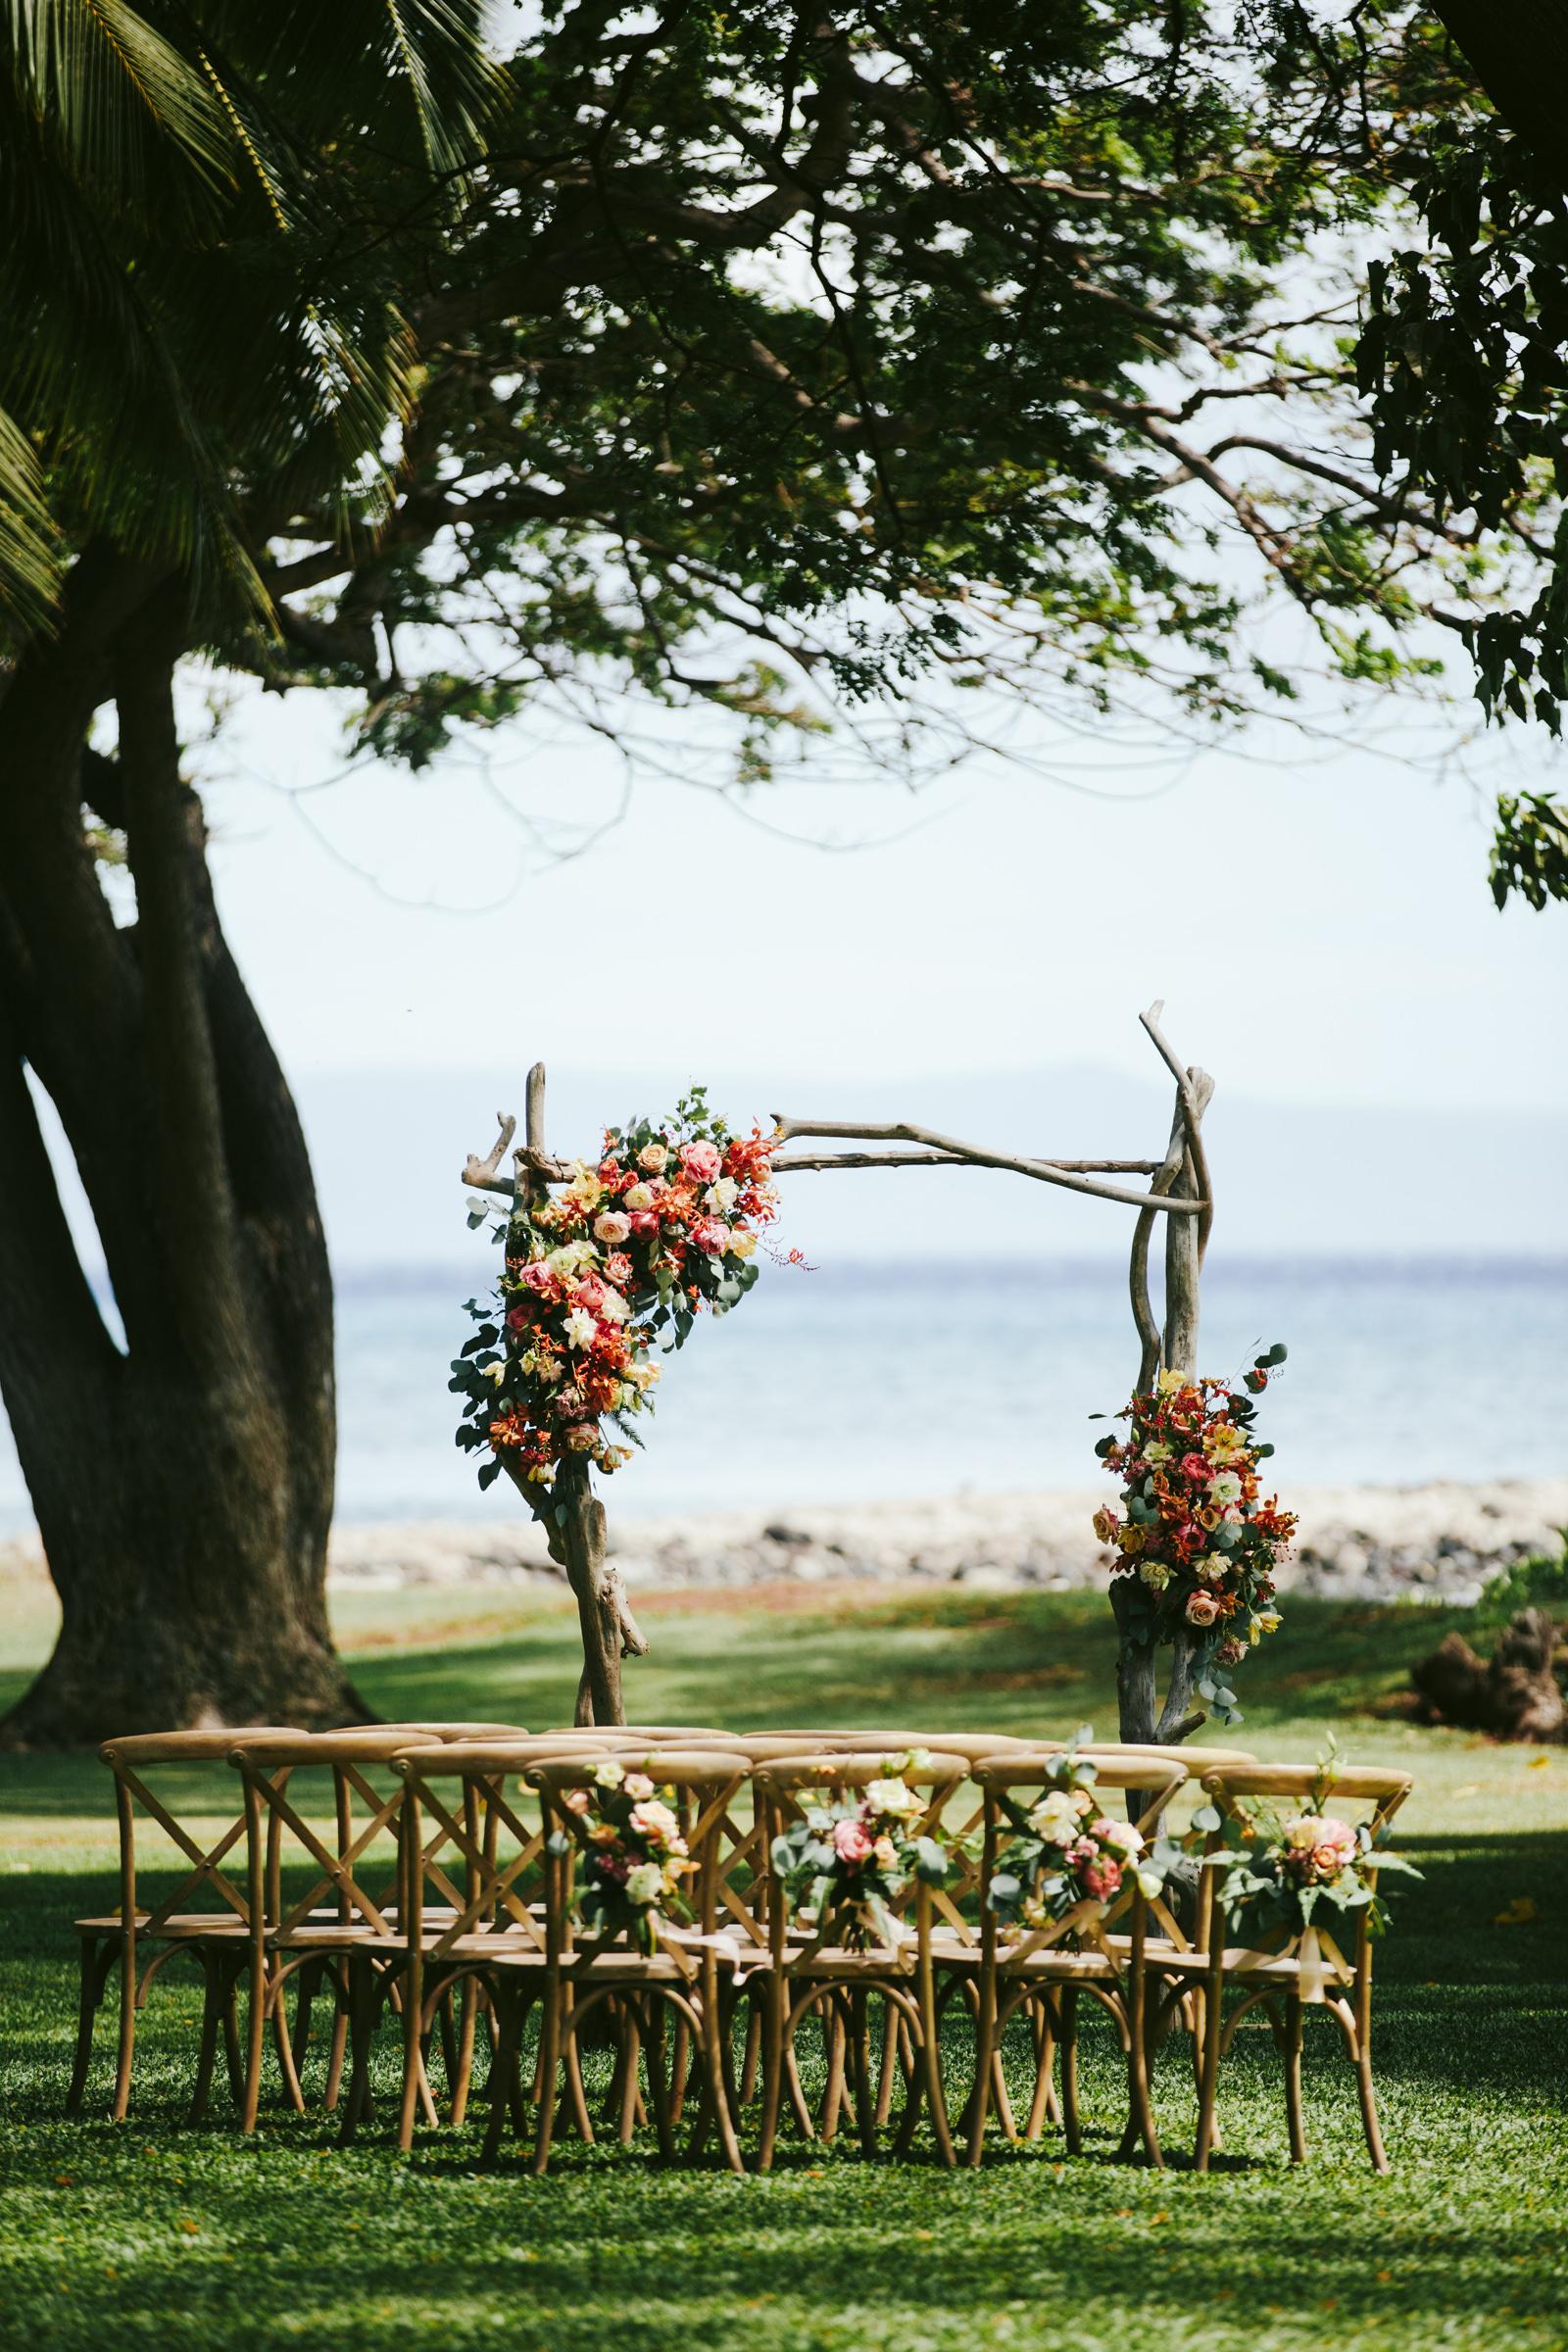 olowalu-plantain-house-wedding-arbor-and-ceremony-seating-melia-lucida